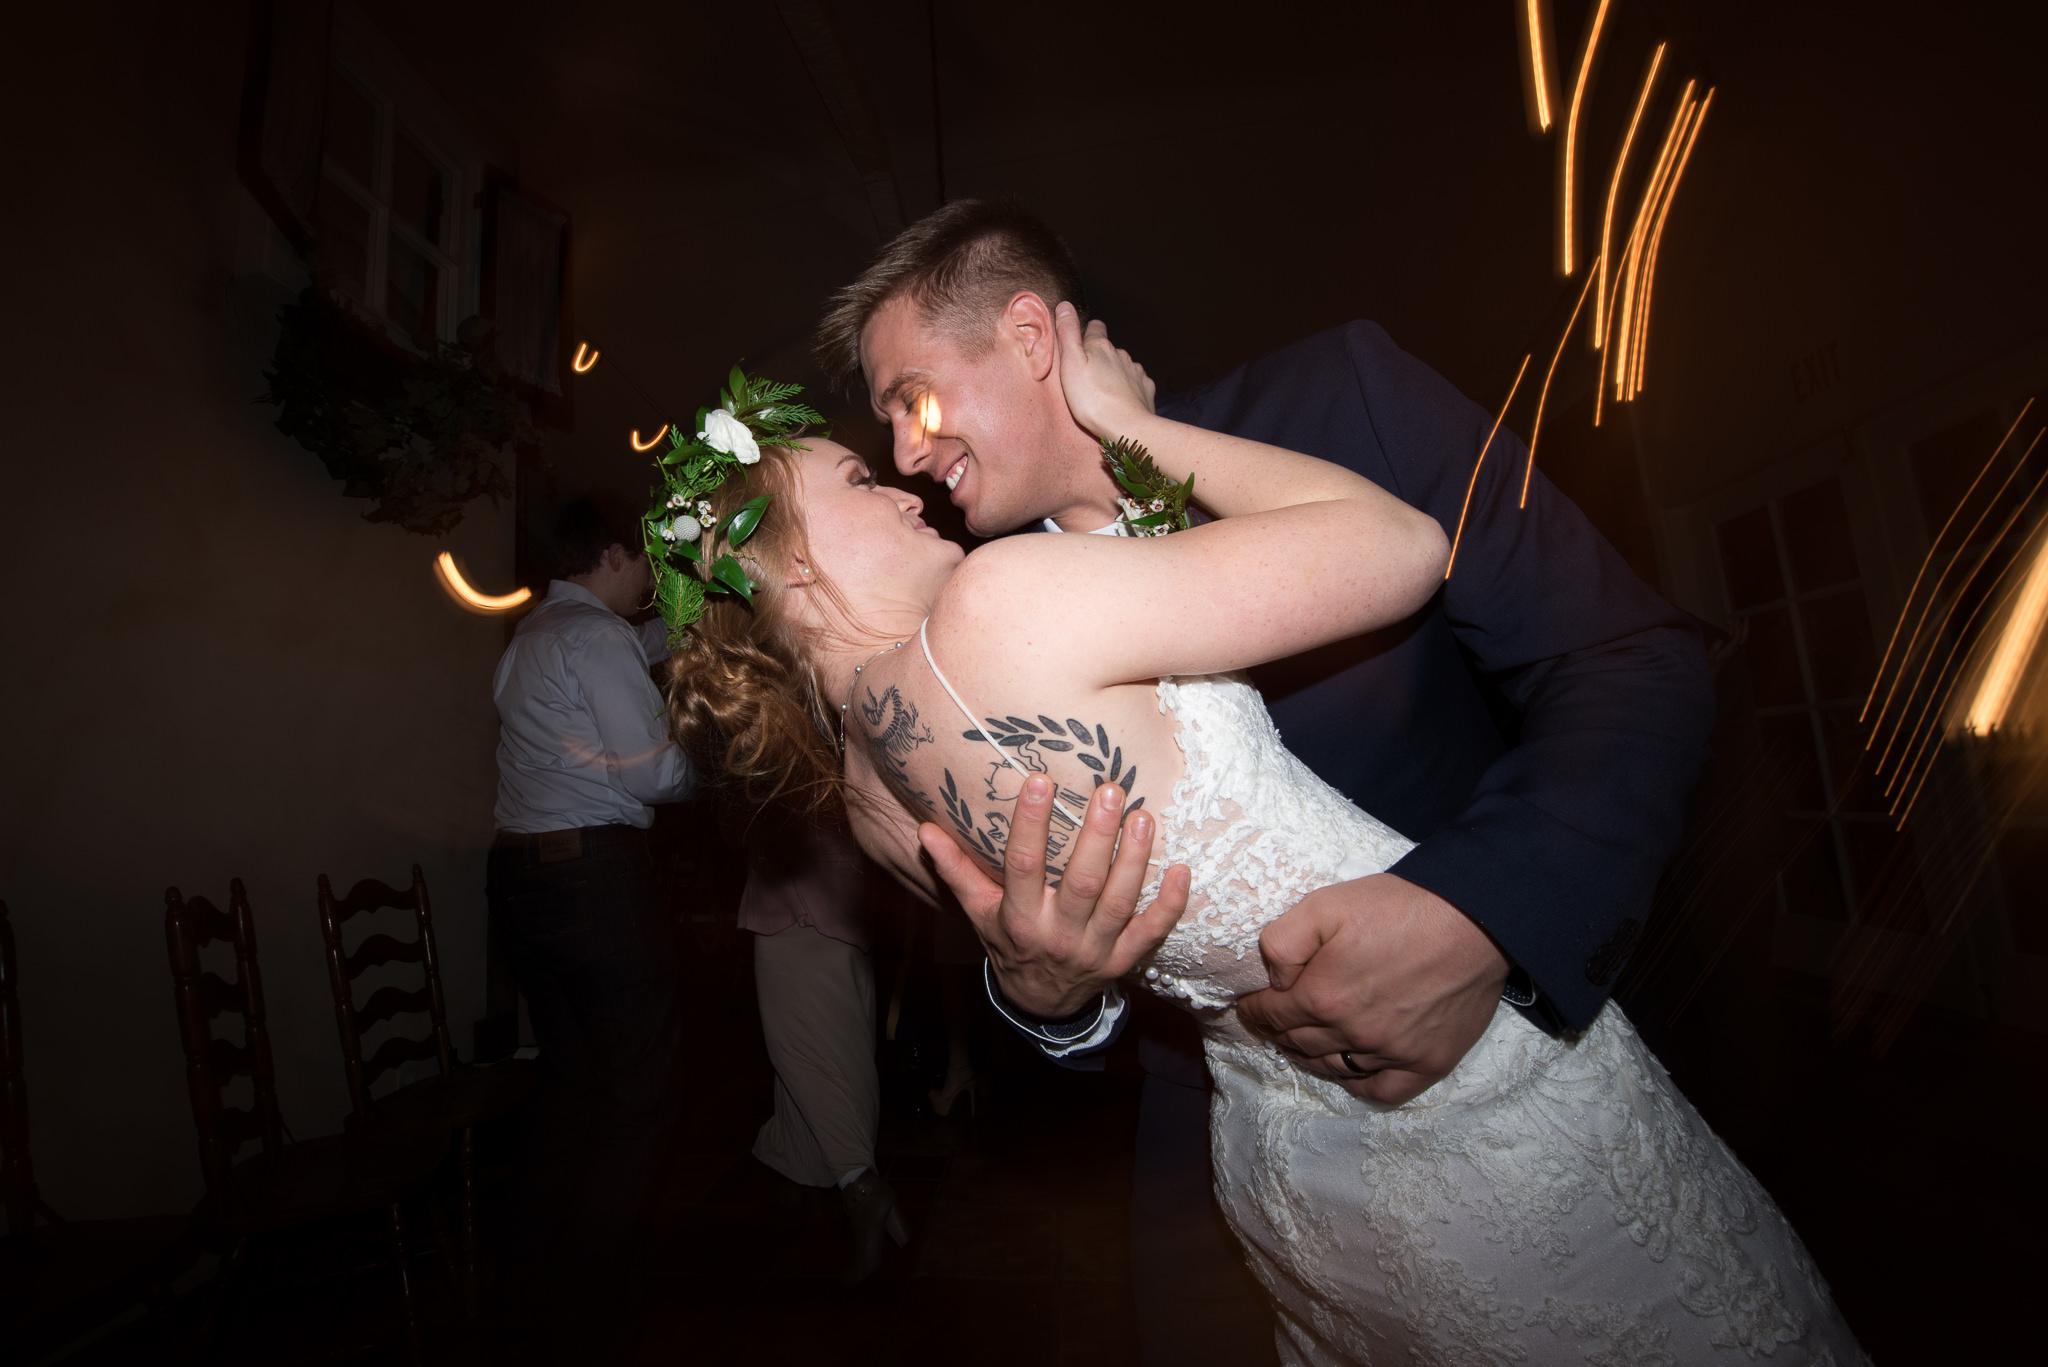 Trevor-Hooper-Wedding-Photographer-The-Bungalow-Wedding-Utah_CLR_072.jpg